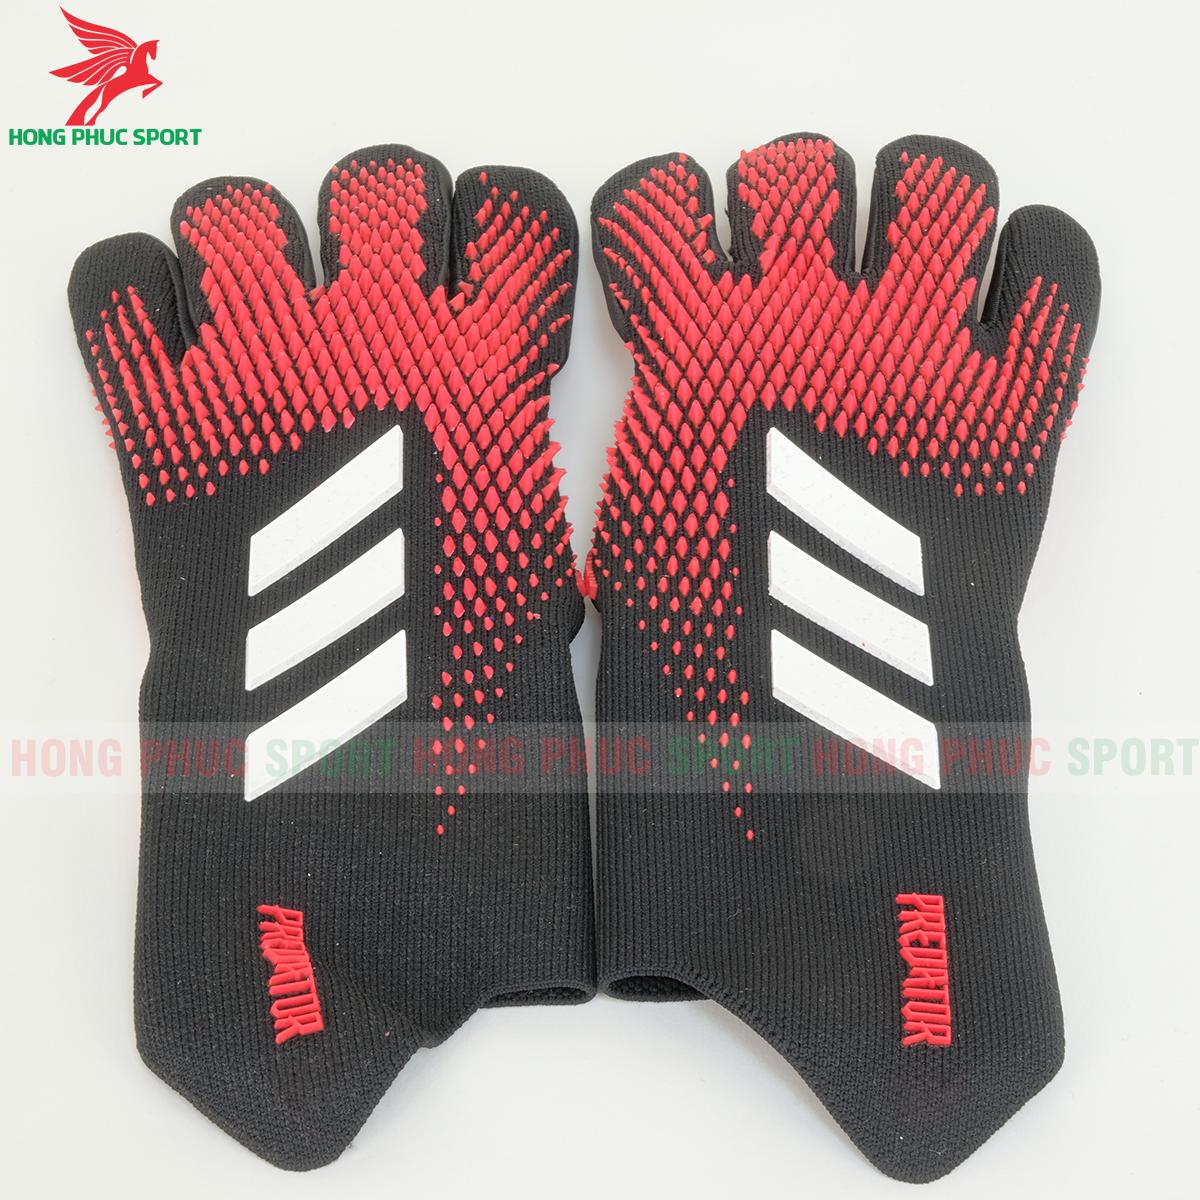 https://cdn.hongphucsport.com/unsafe/s4.shopbay.vn/files/285/gang-tay-thu-mon-adidas-predator-gl-mutator-urg-20-mau-3-2-5f7c466a07c69.png